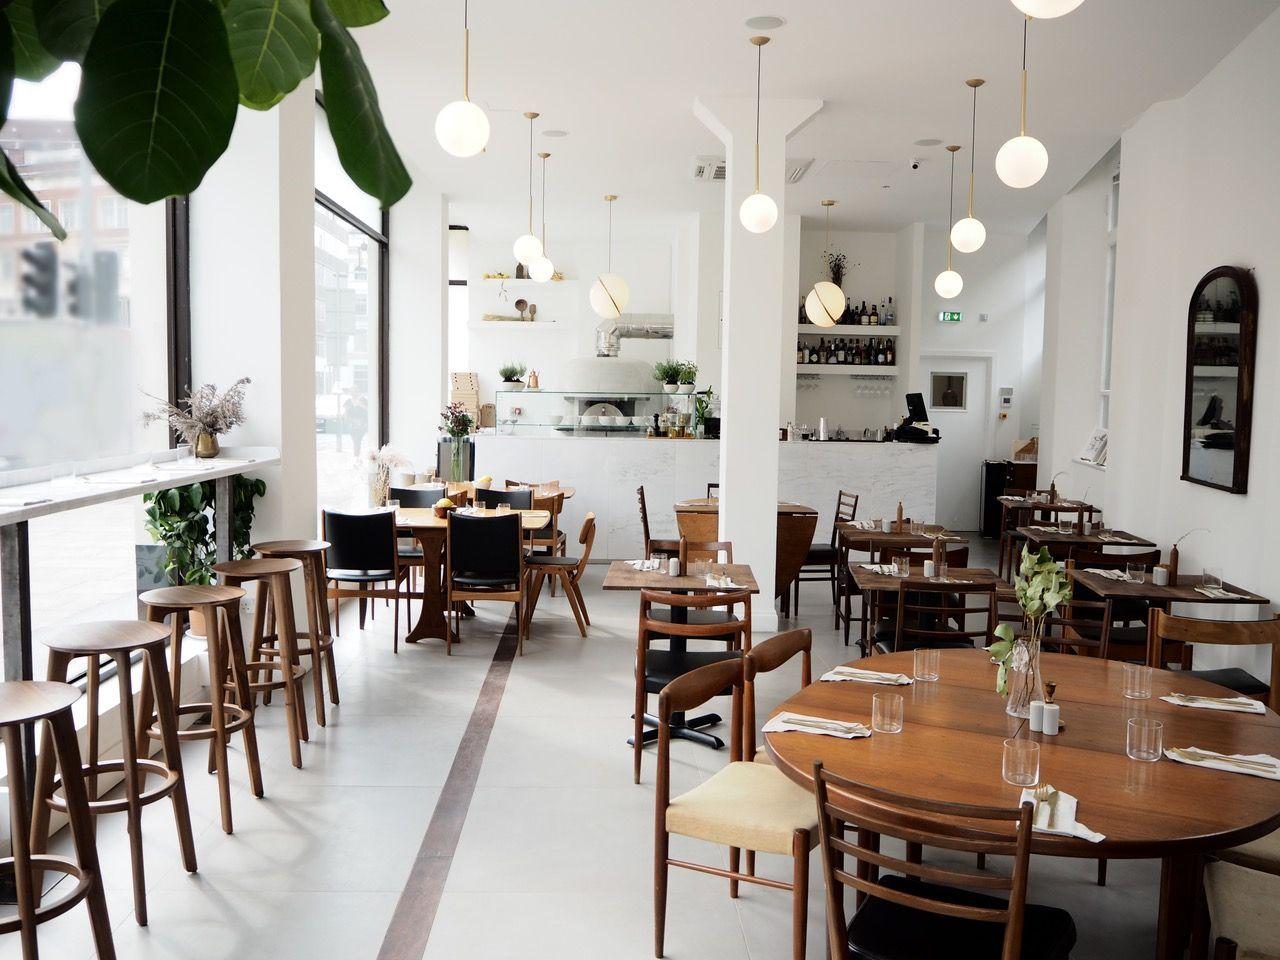 The Chosen Furniture In Over Restaurant Is Teak Scandinavian Style From Mid Twentieth Century Carefully Selected F Bars For Home London Restaurants Restaurant